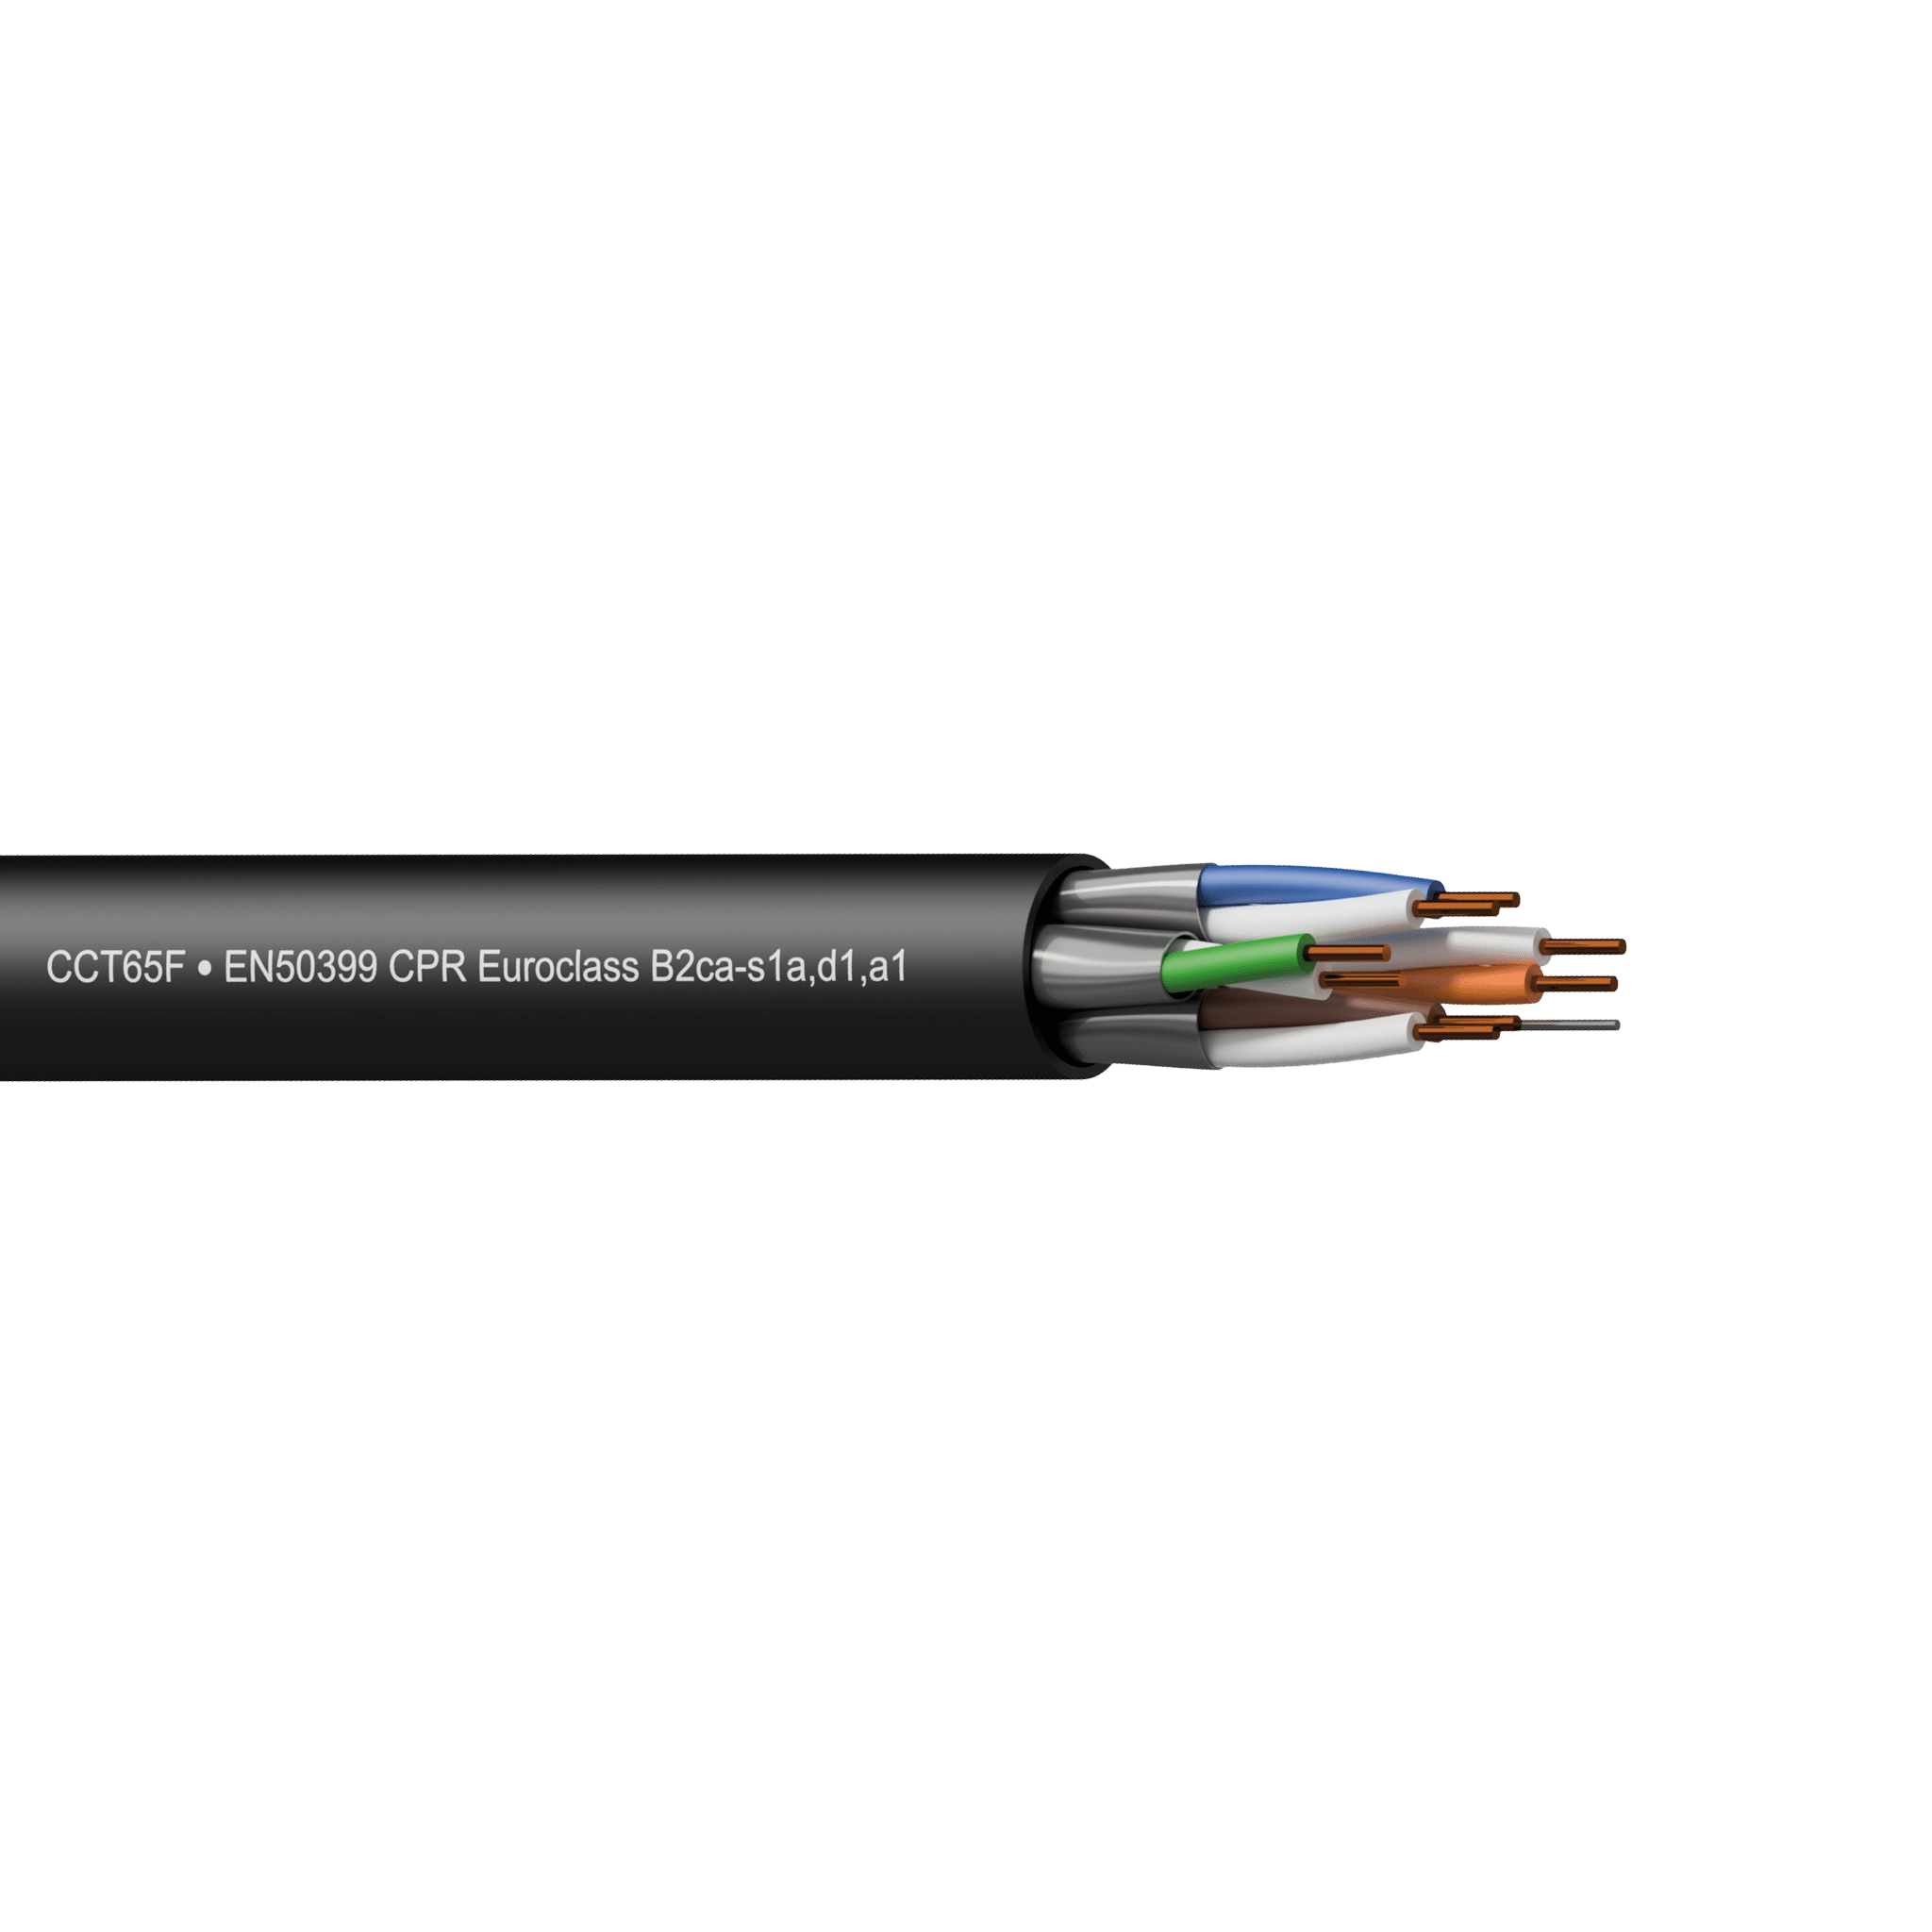 PROMO6D-CCT65F-B2CA - Sample pack CCT65F-B2ca